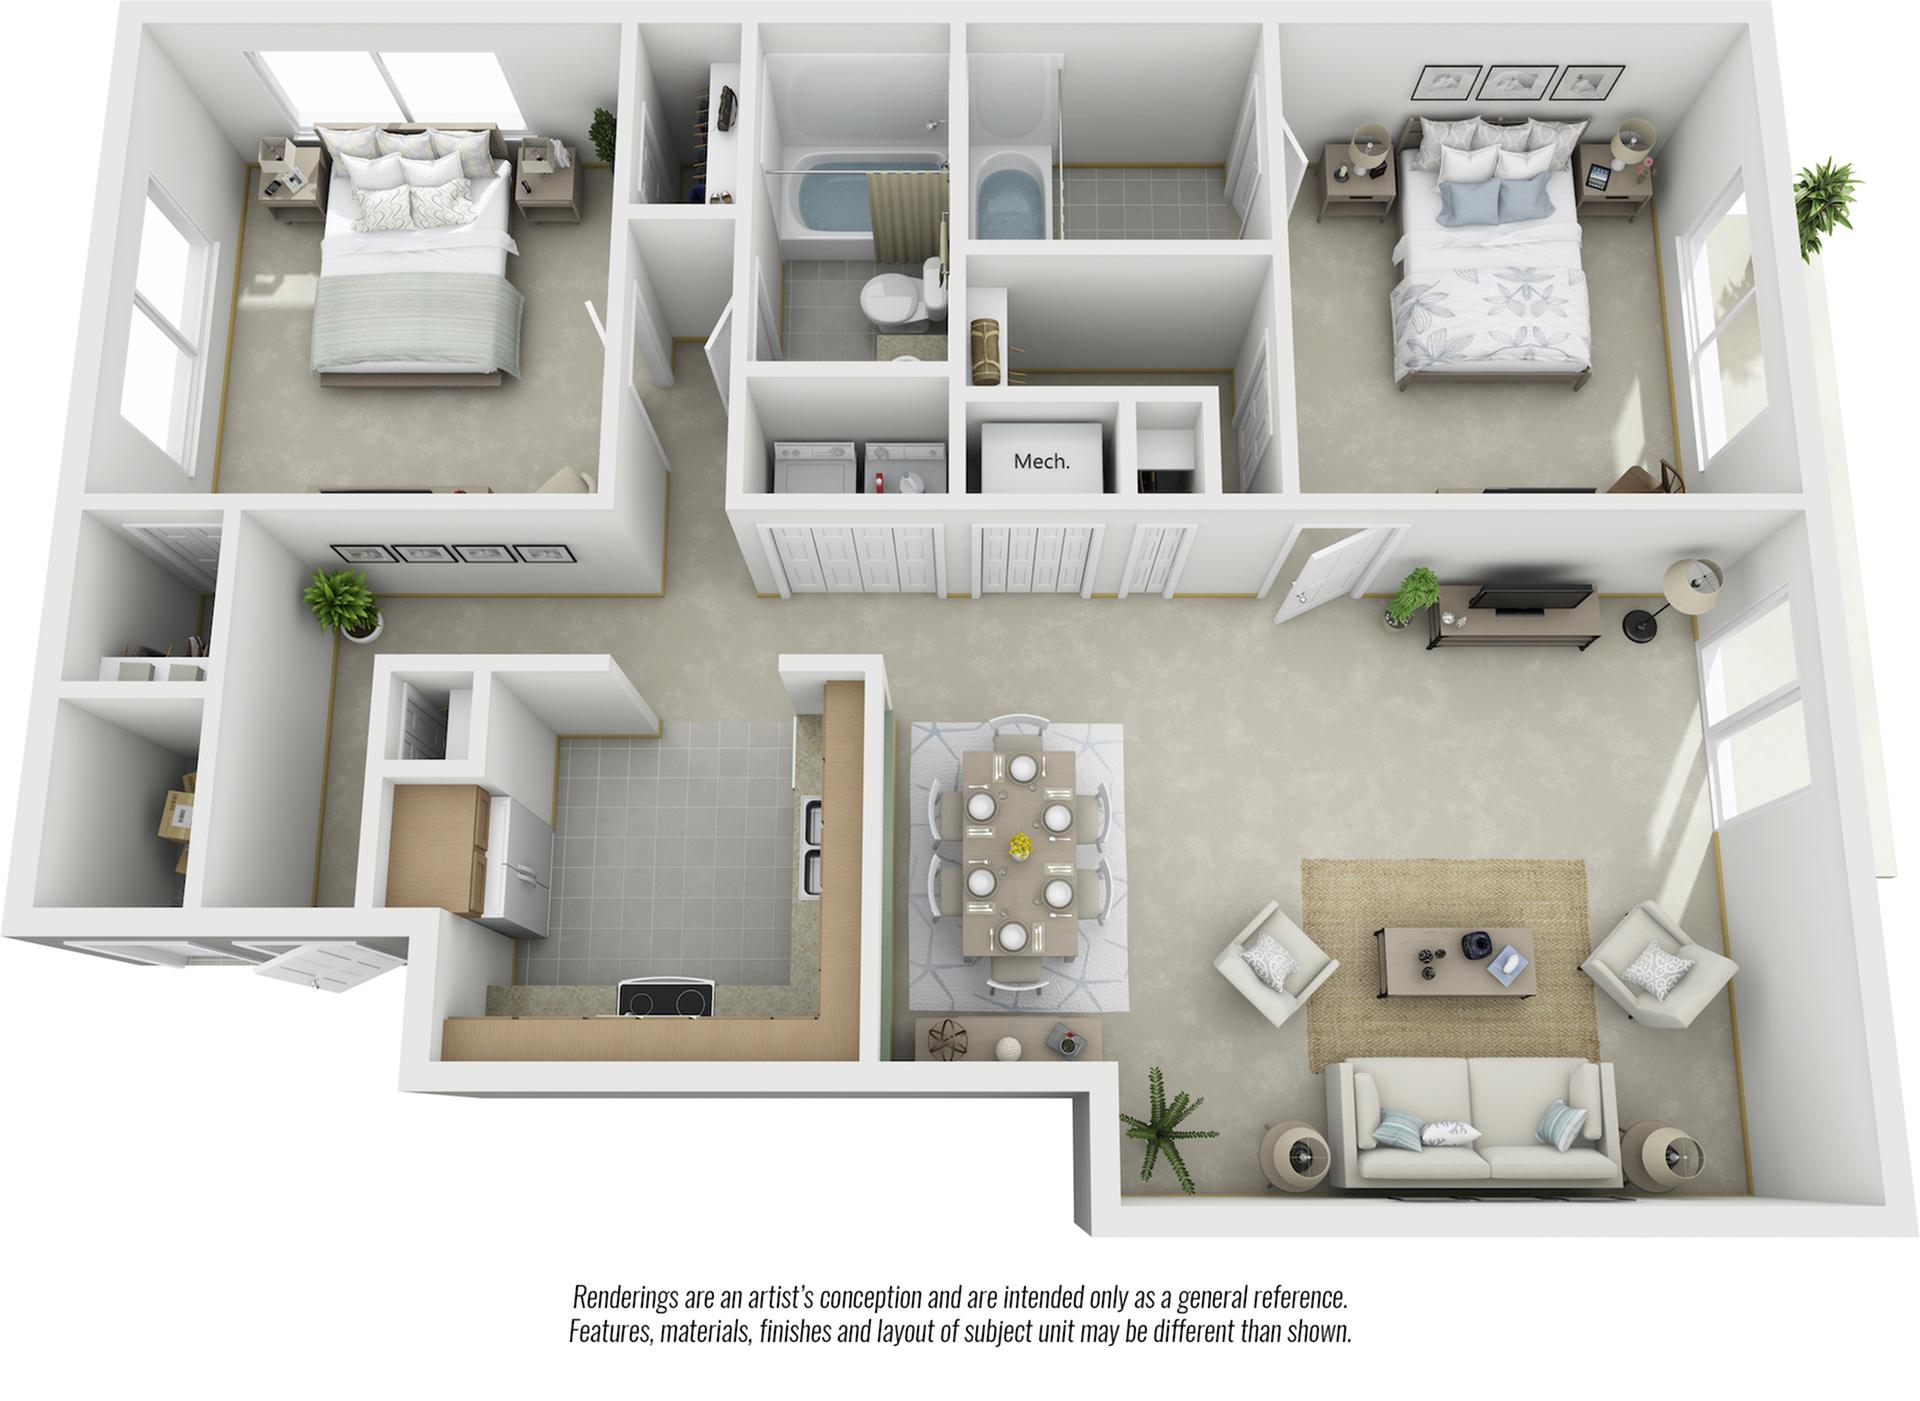 Chestnut 2 bedrooms 2 bathrooms floor plan with premium finishes